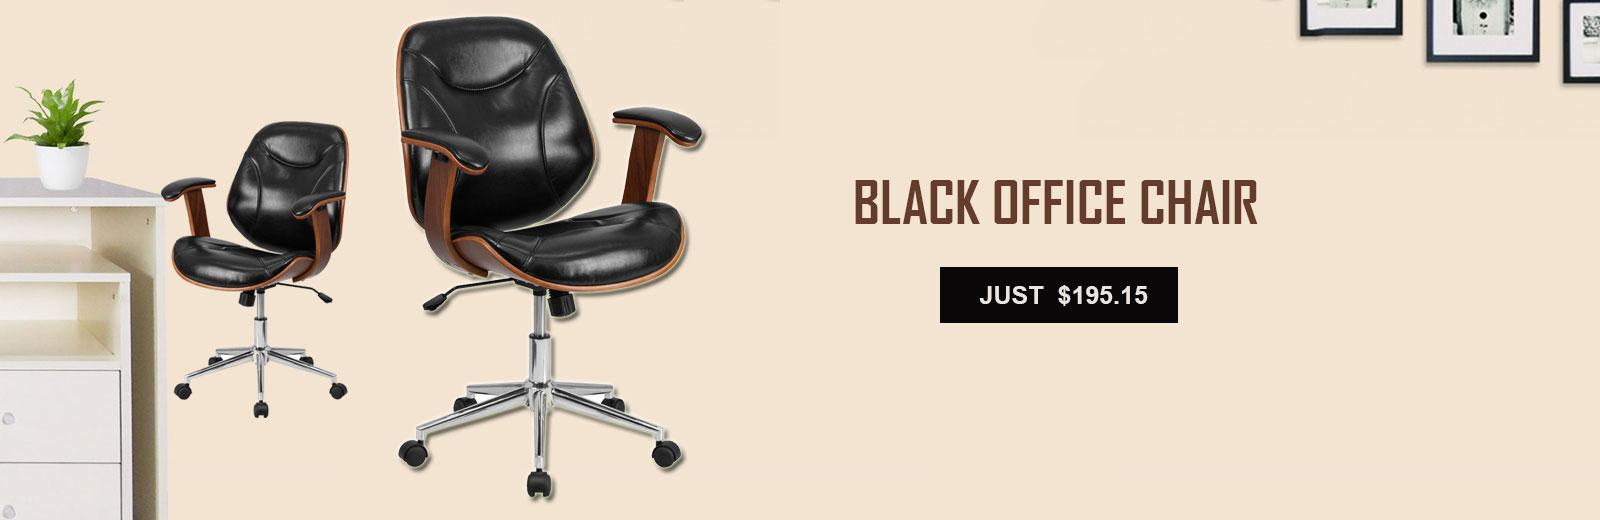 Blackofficechair